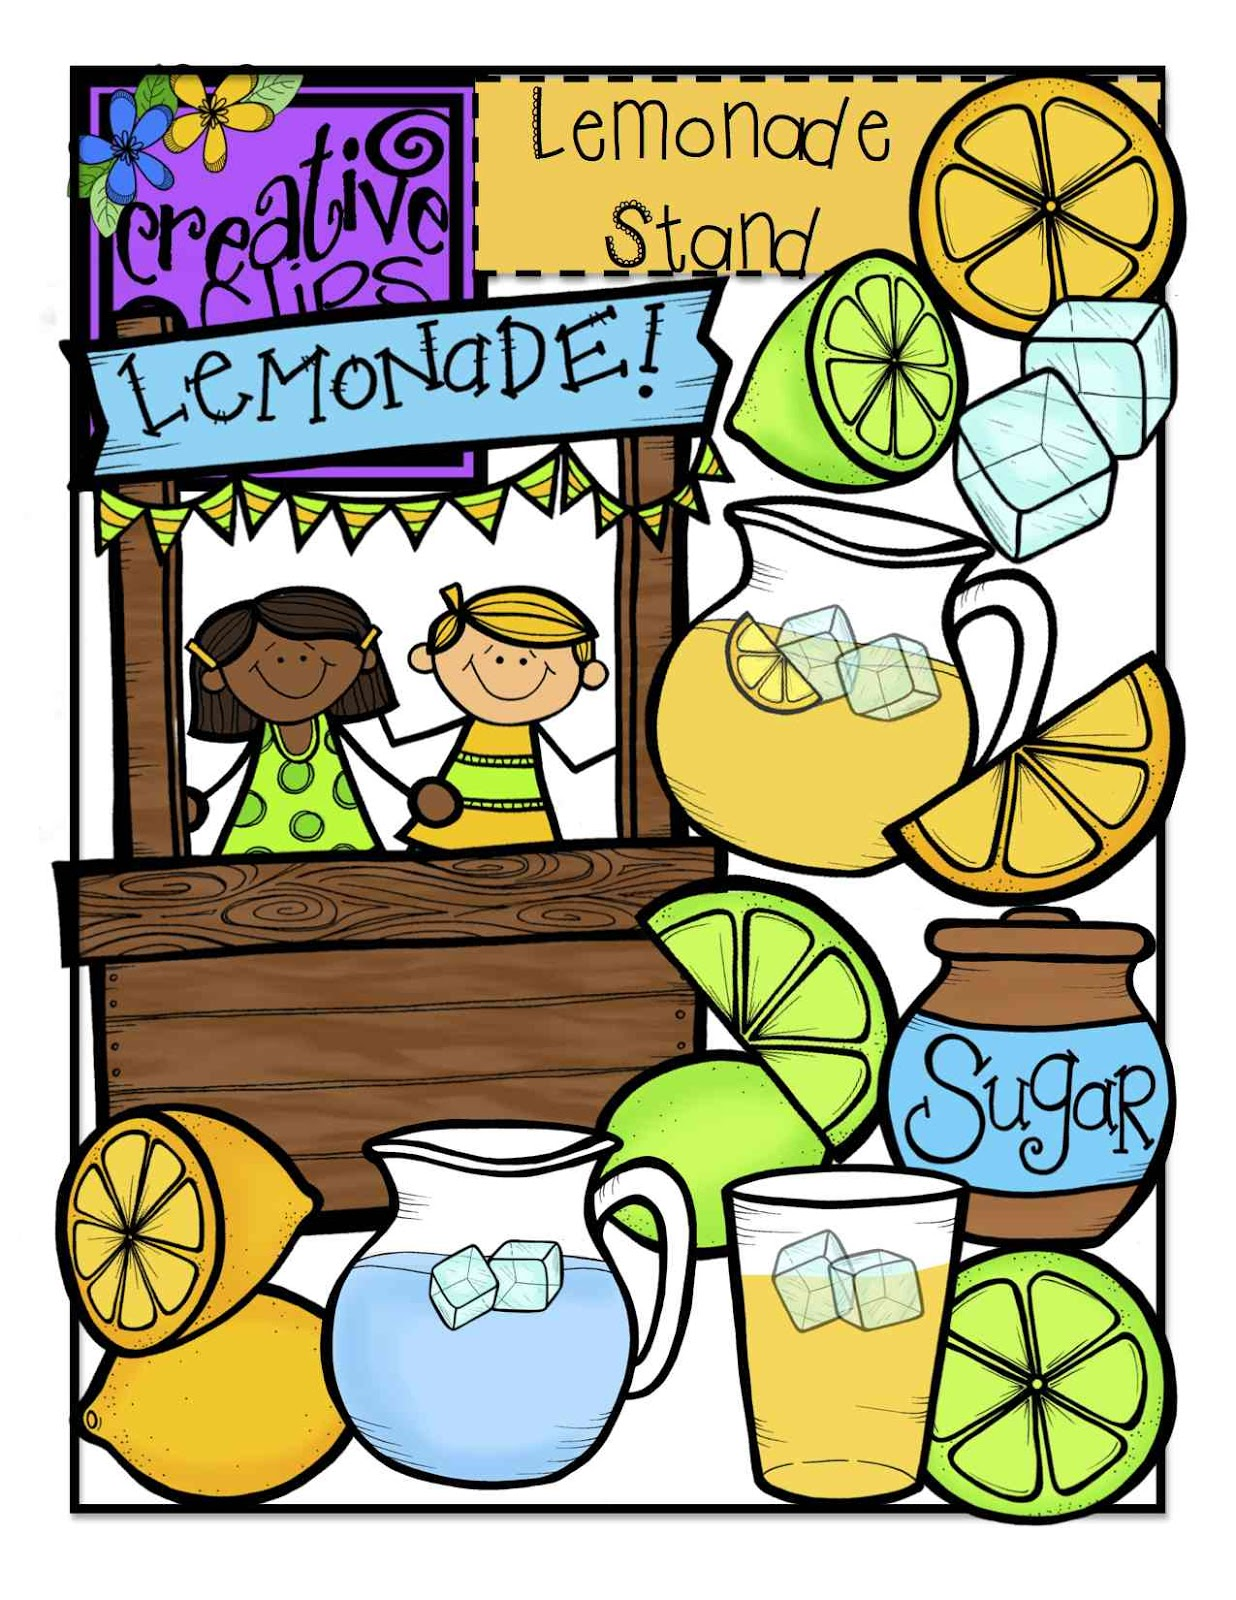 Lemonade Stand Clipart {Echo . All You H-Lemonade stand clipart {Echo . All you have to do is u0026quot;likeu0026quot; .-12